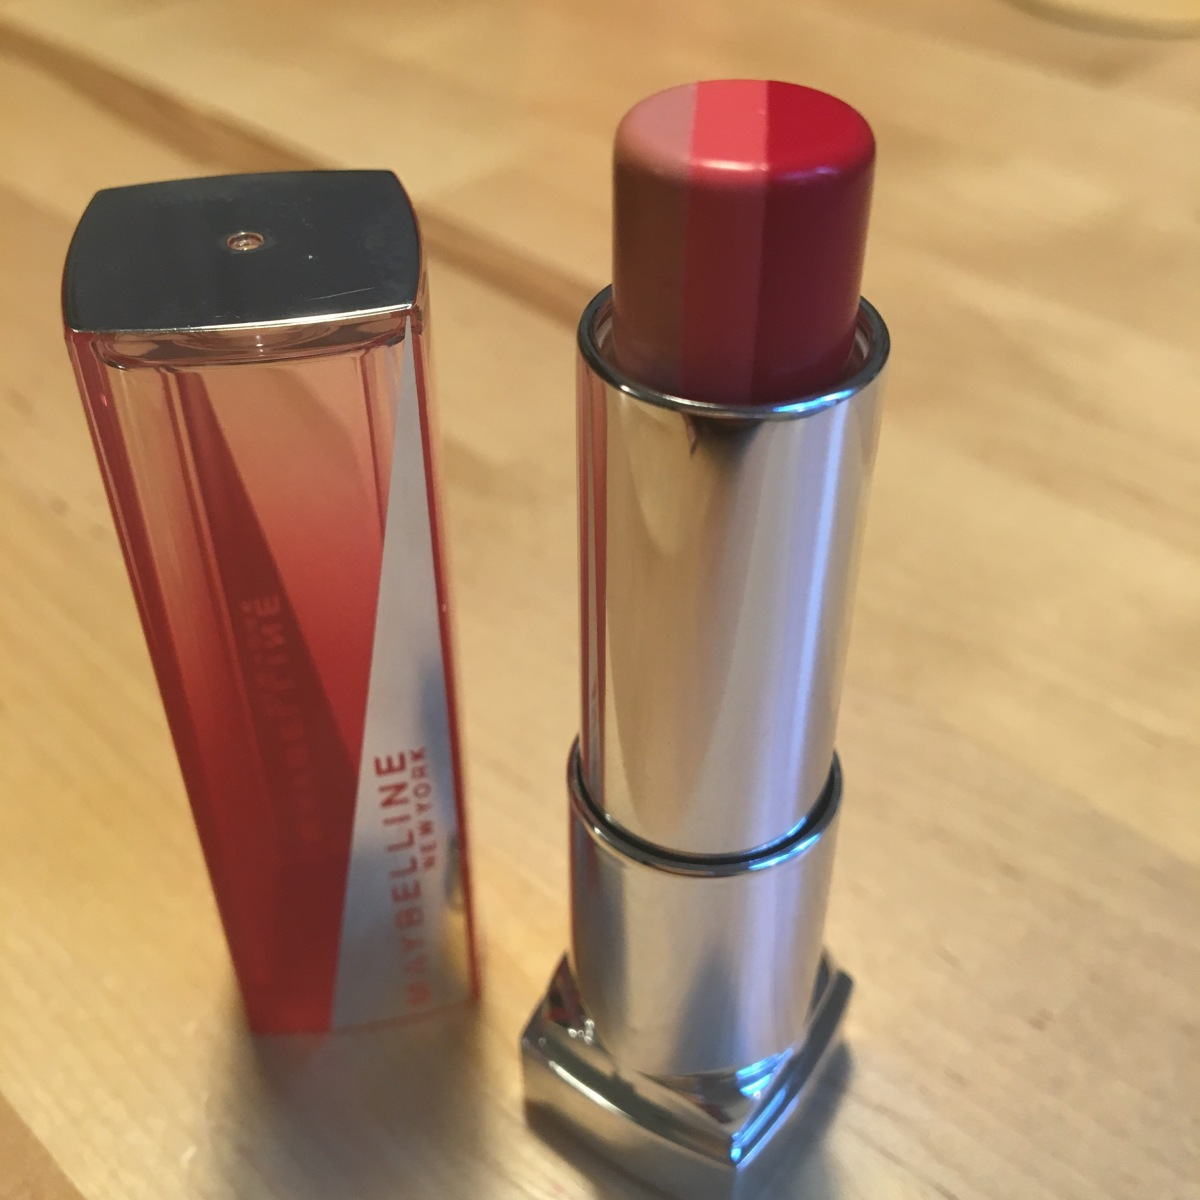 Three Tone LipsticksReview